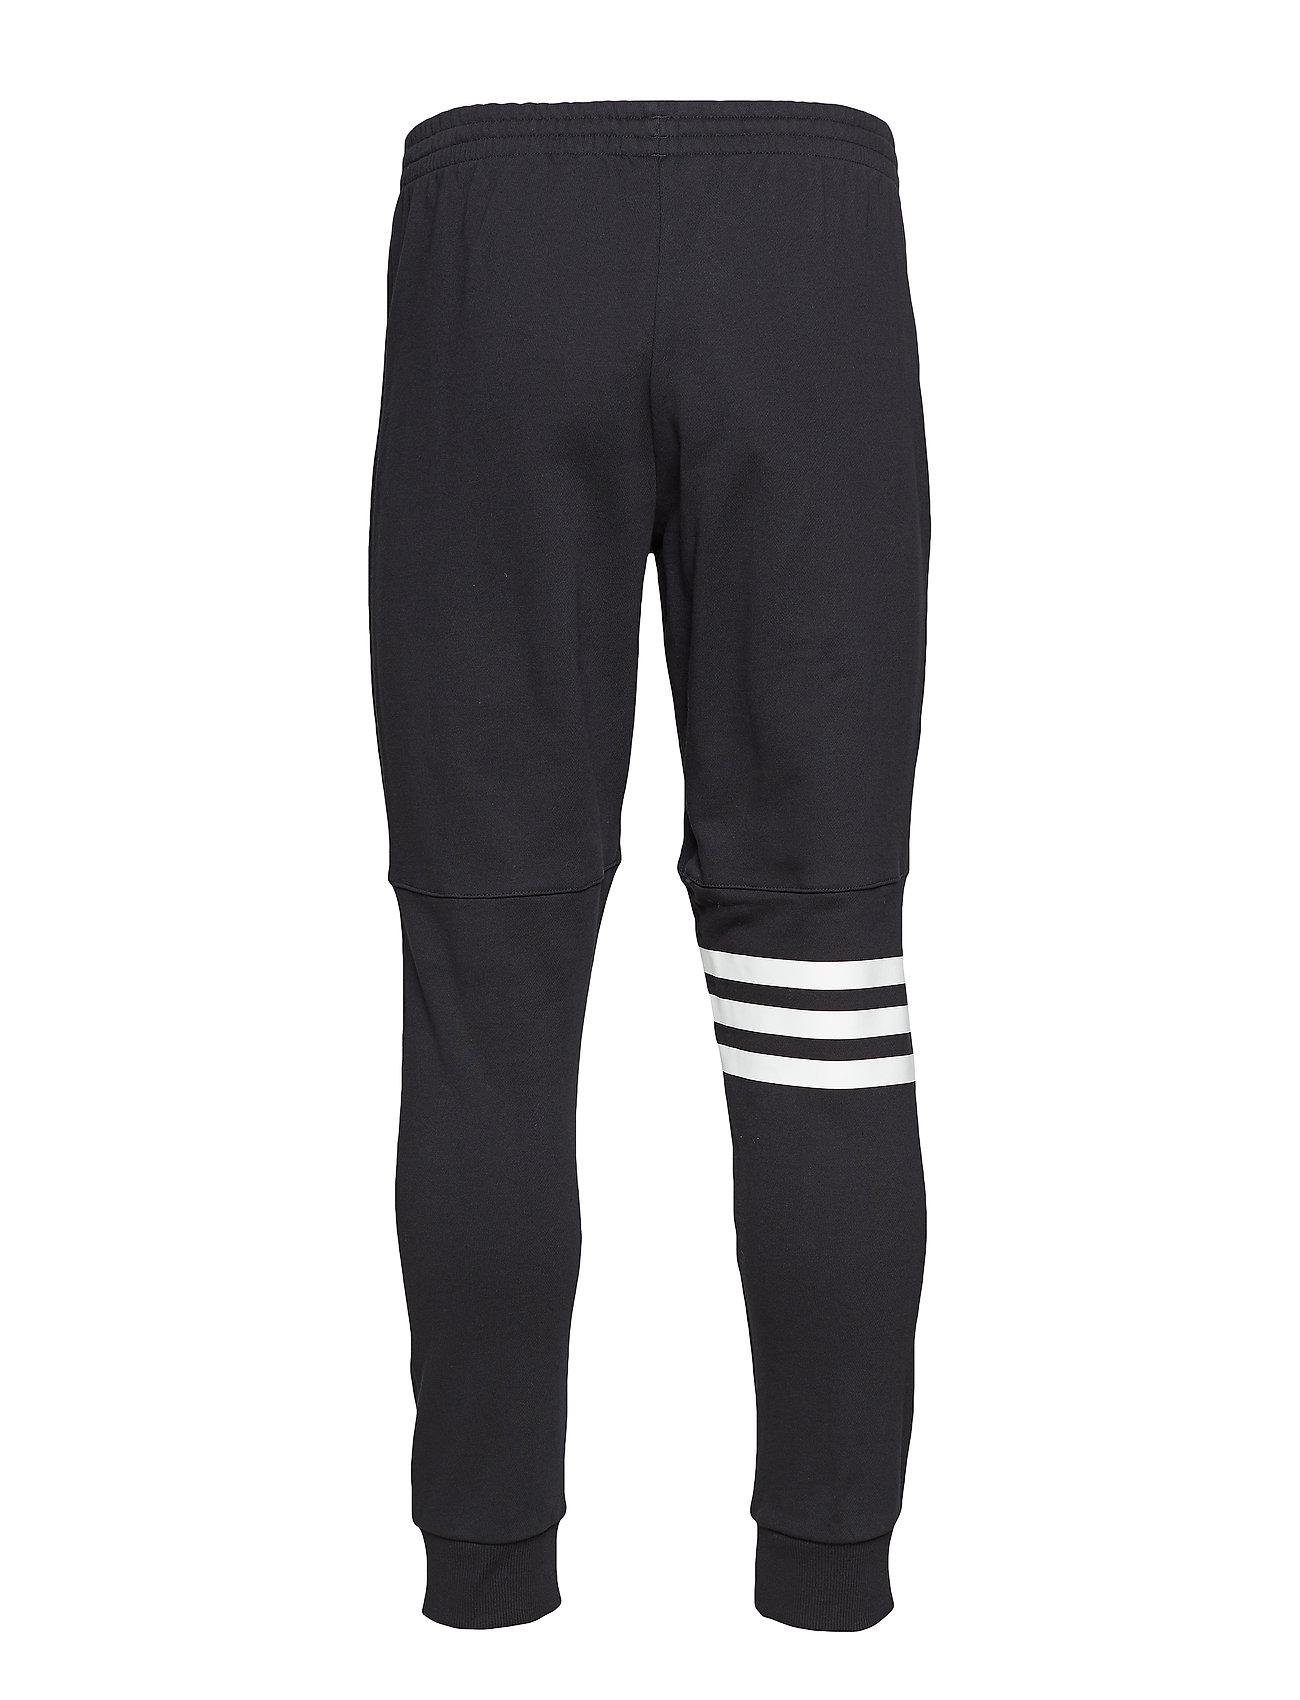 competitive price 94273 df9ff Adidas ALE Vaatteet netistä   Nyt jopa -60%   SPOT-A-SHOP